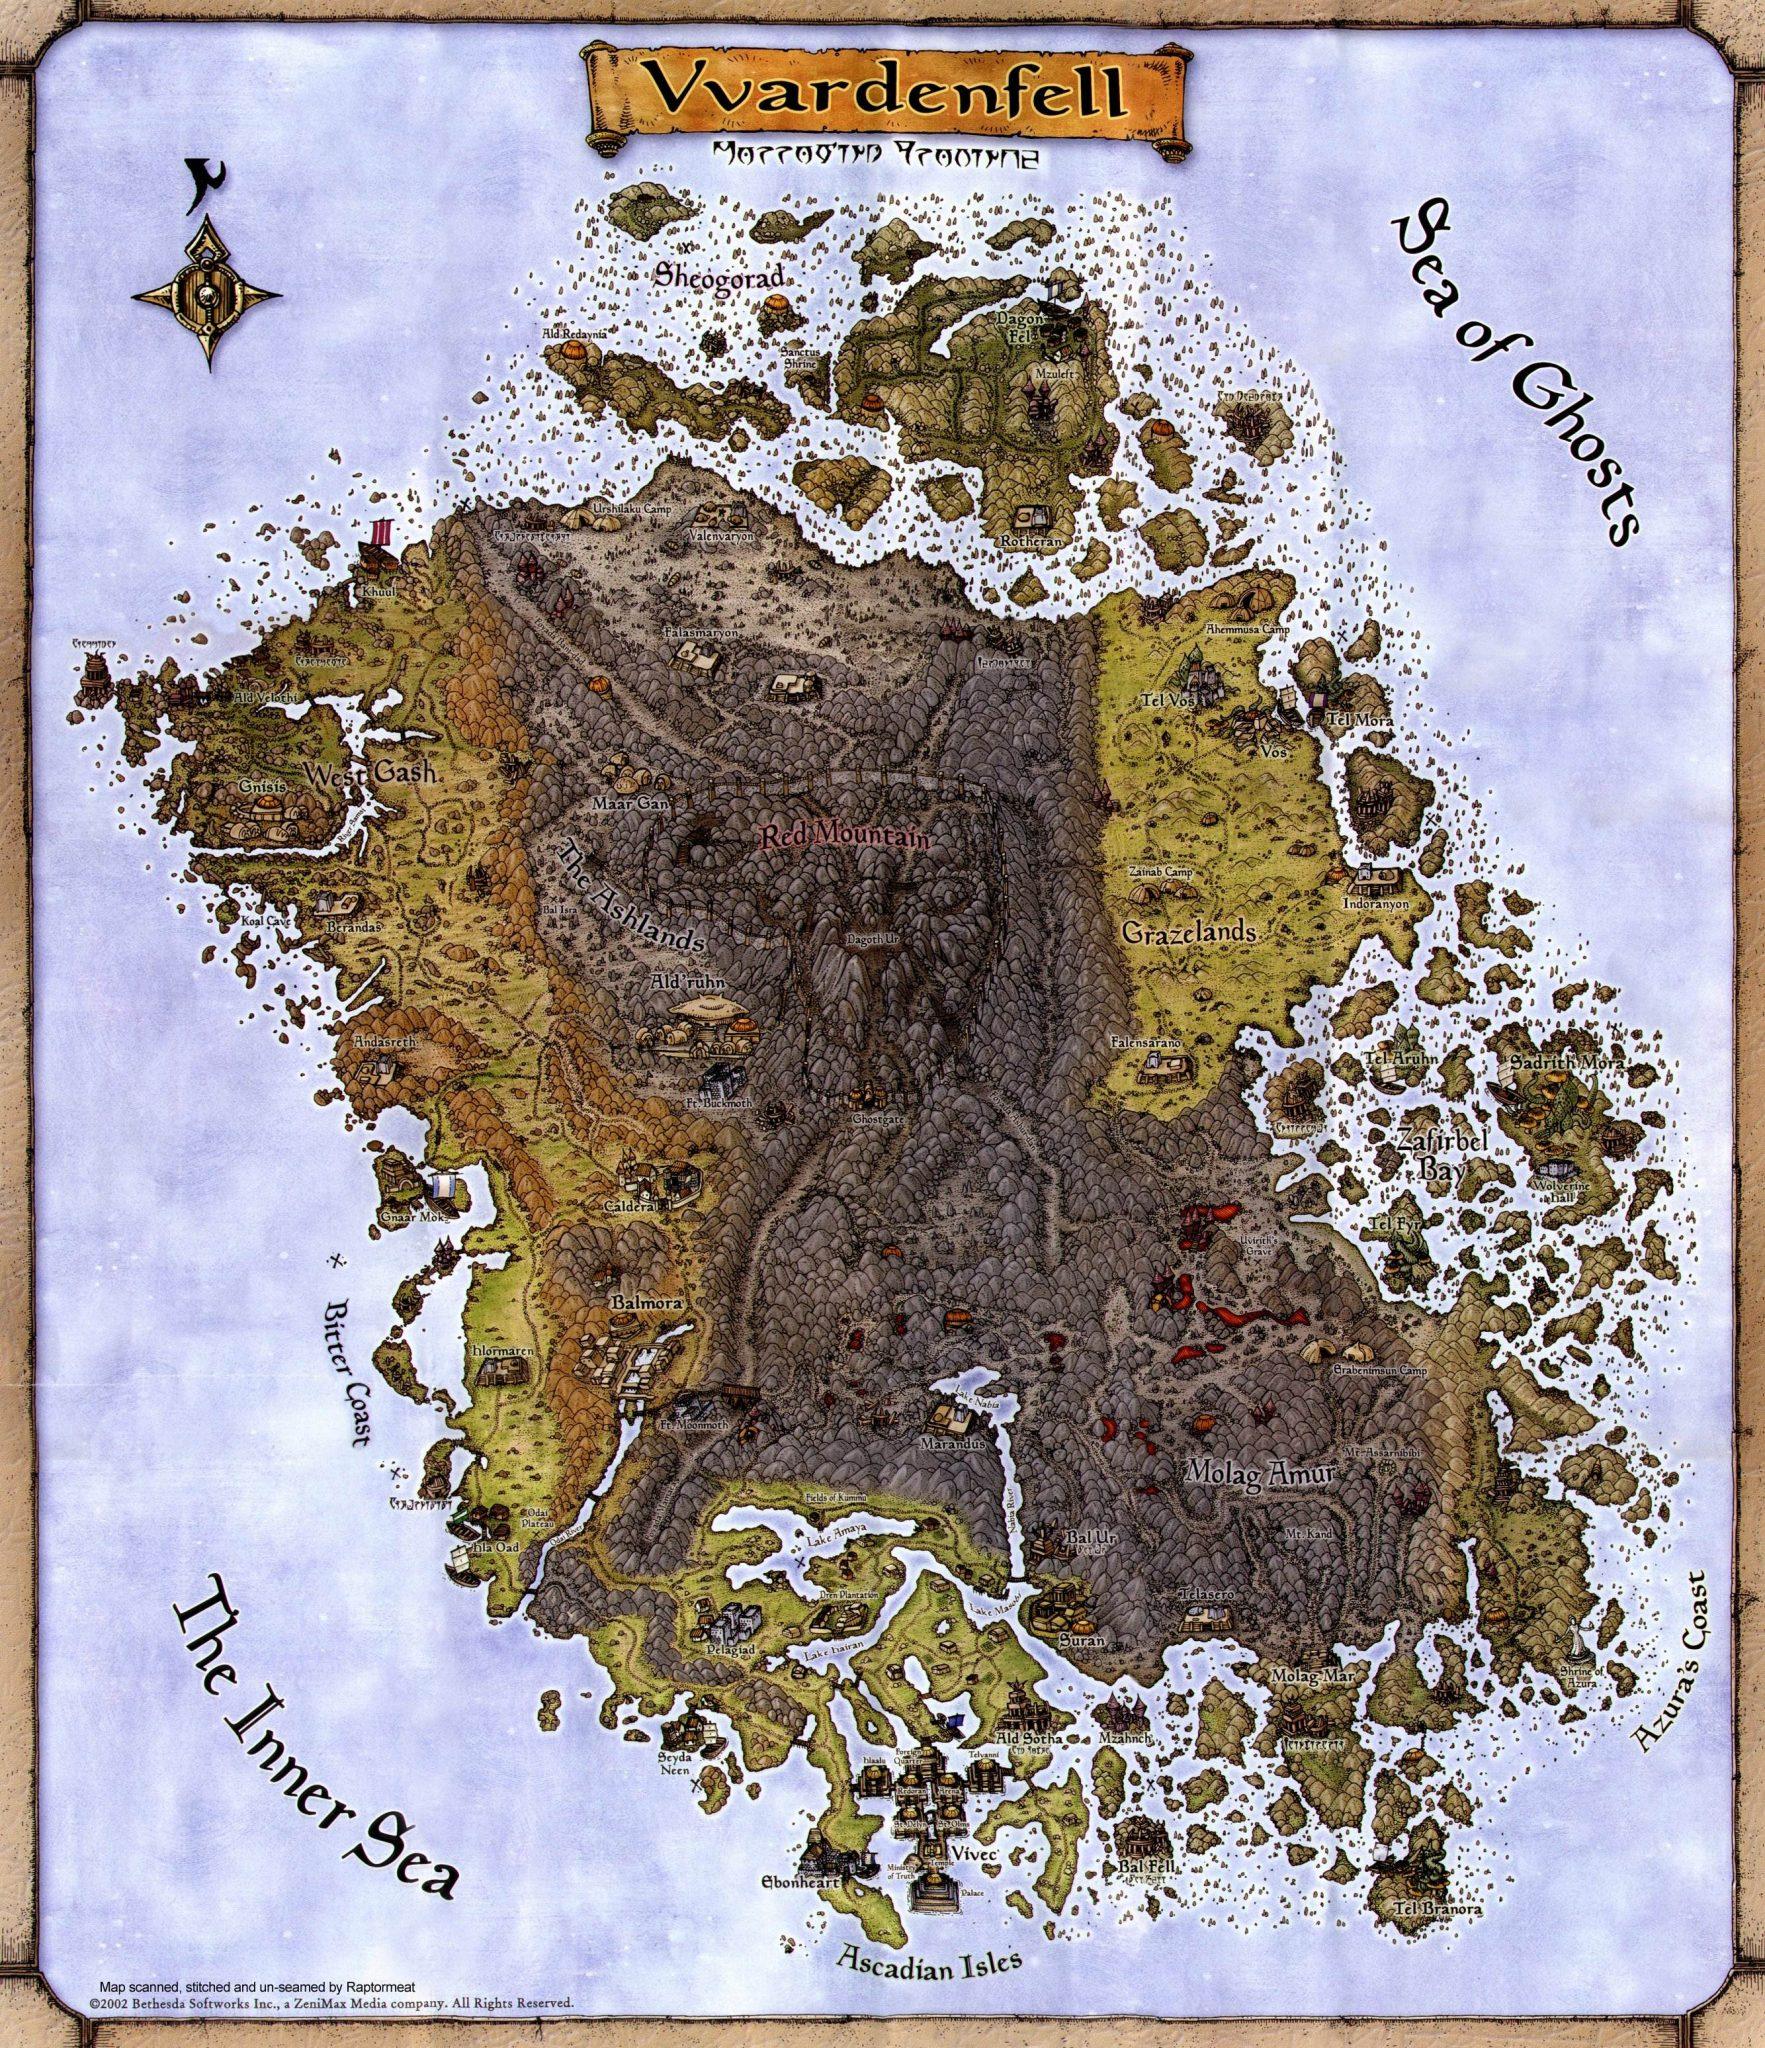 MW-Map-Vvardenfell